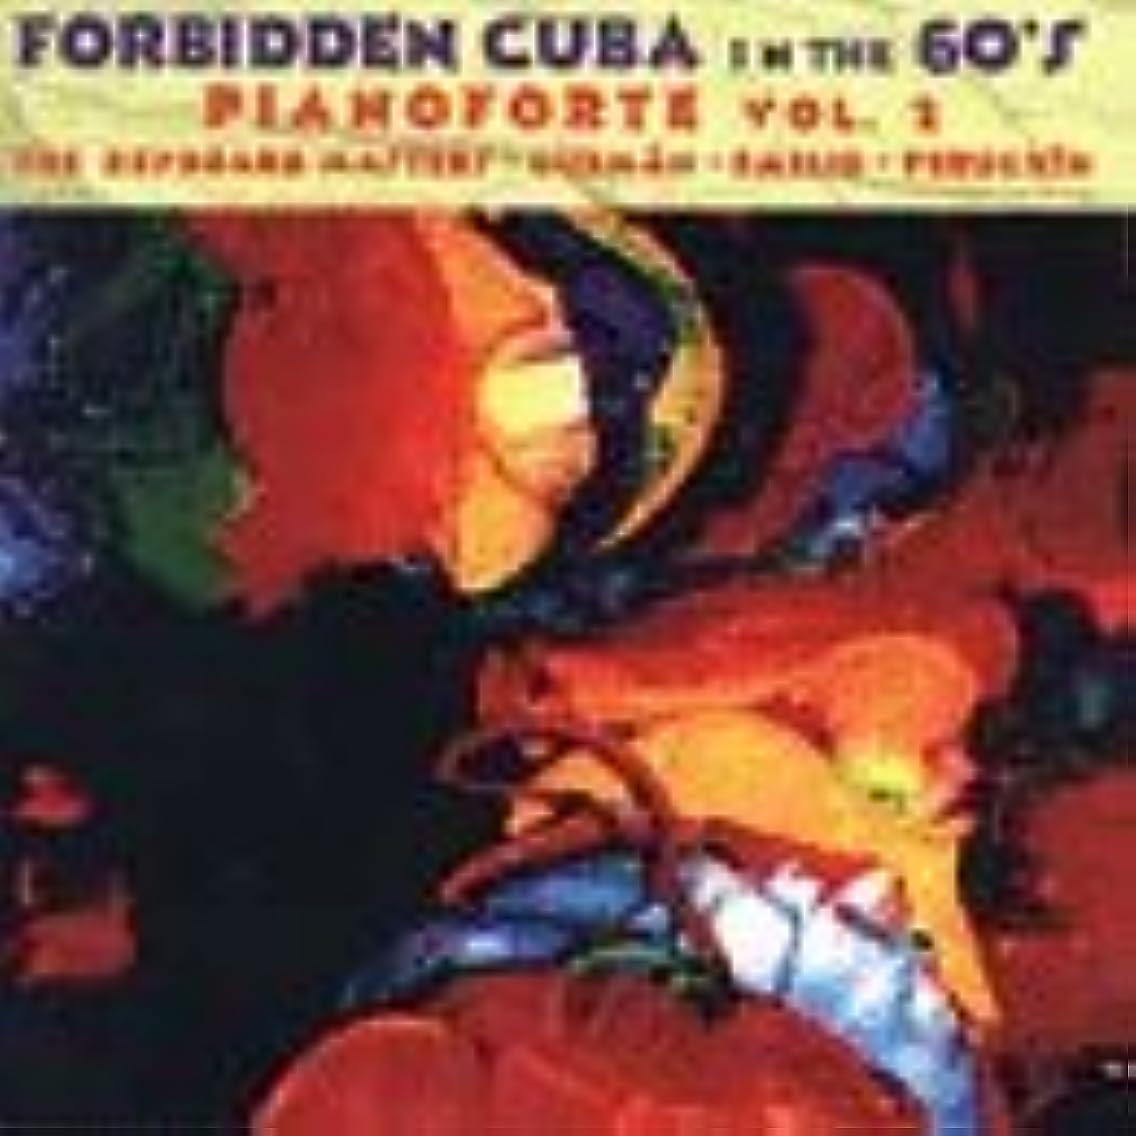 Forbidden Cuba In The '60s: Pianoforte, Vol. 2 - The Keyboard Masters